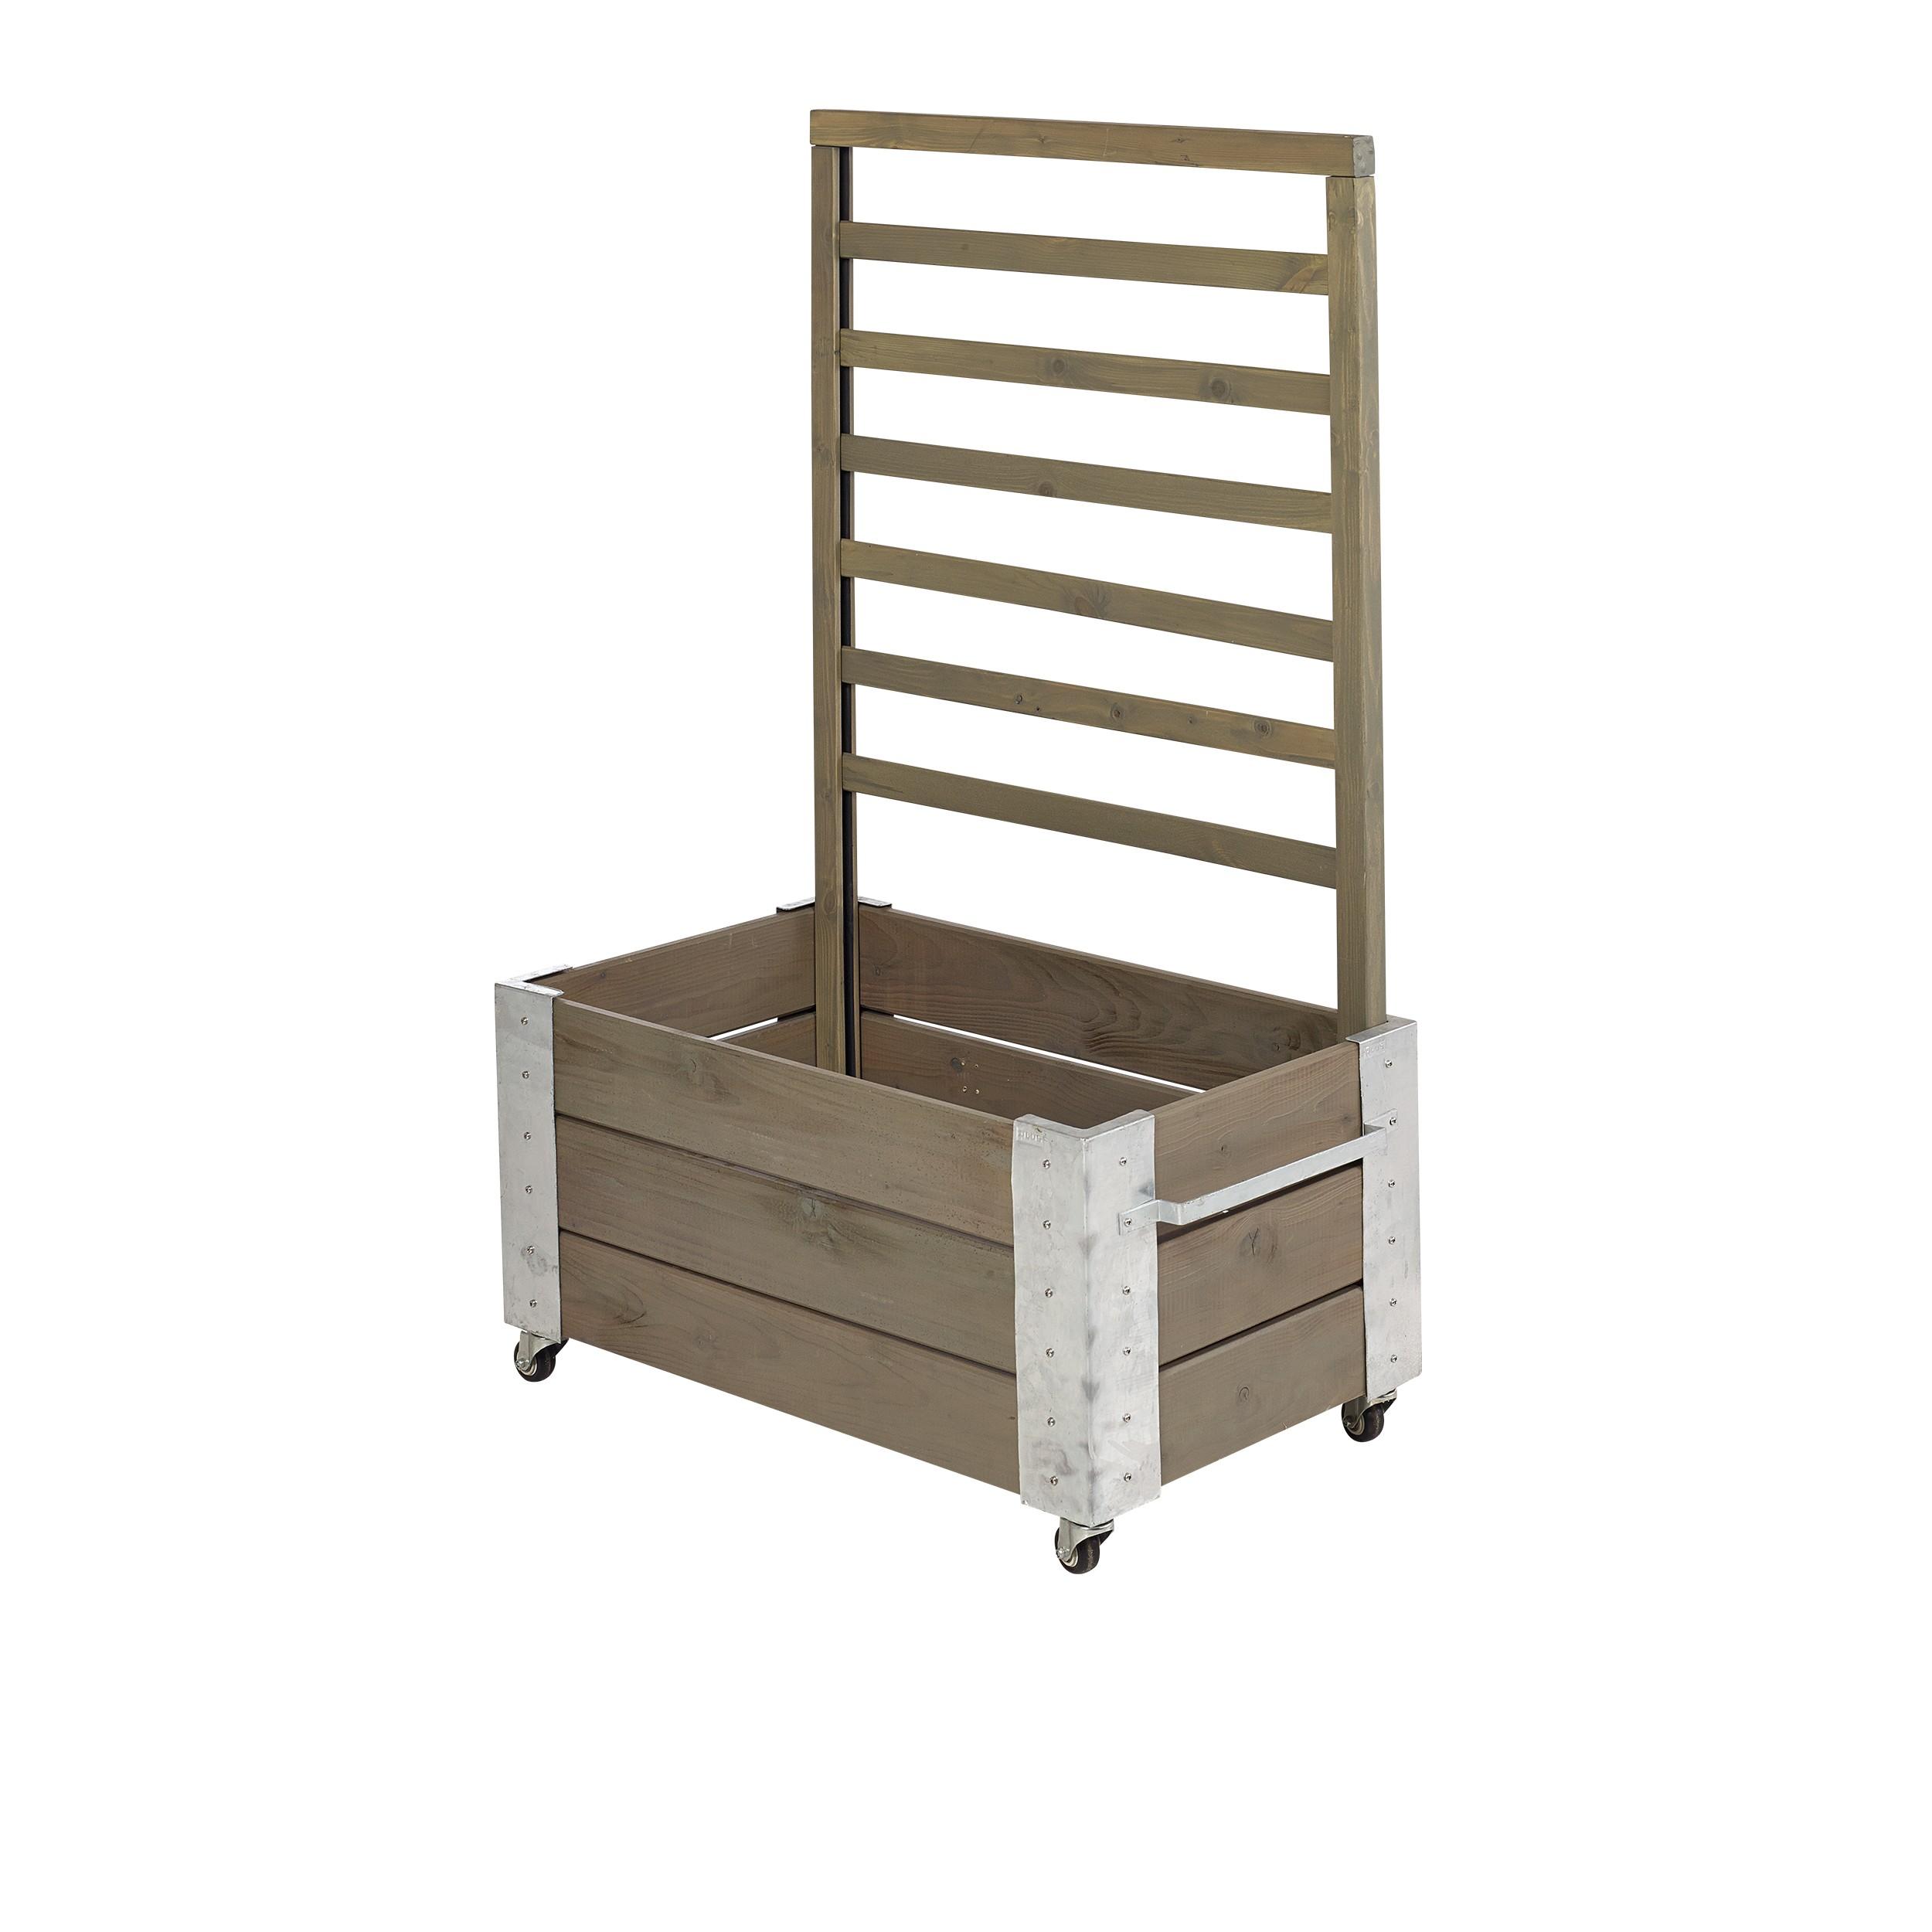 pflanzkasten mit spalier pflanzkasten mit spalier eckelement b 50 cm h 140 cm khw pflanzkasten. Black Bedroom Furniture Sets. Home Design Ideas